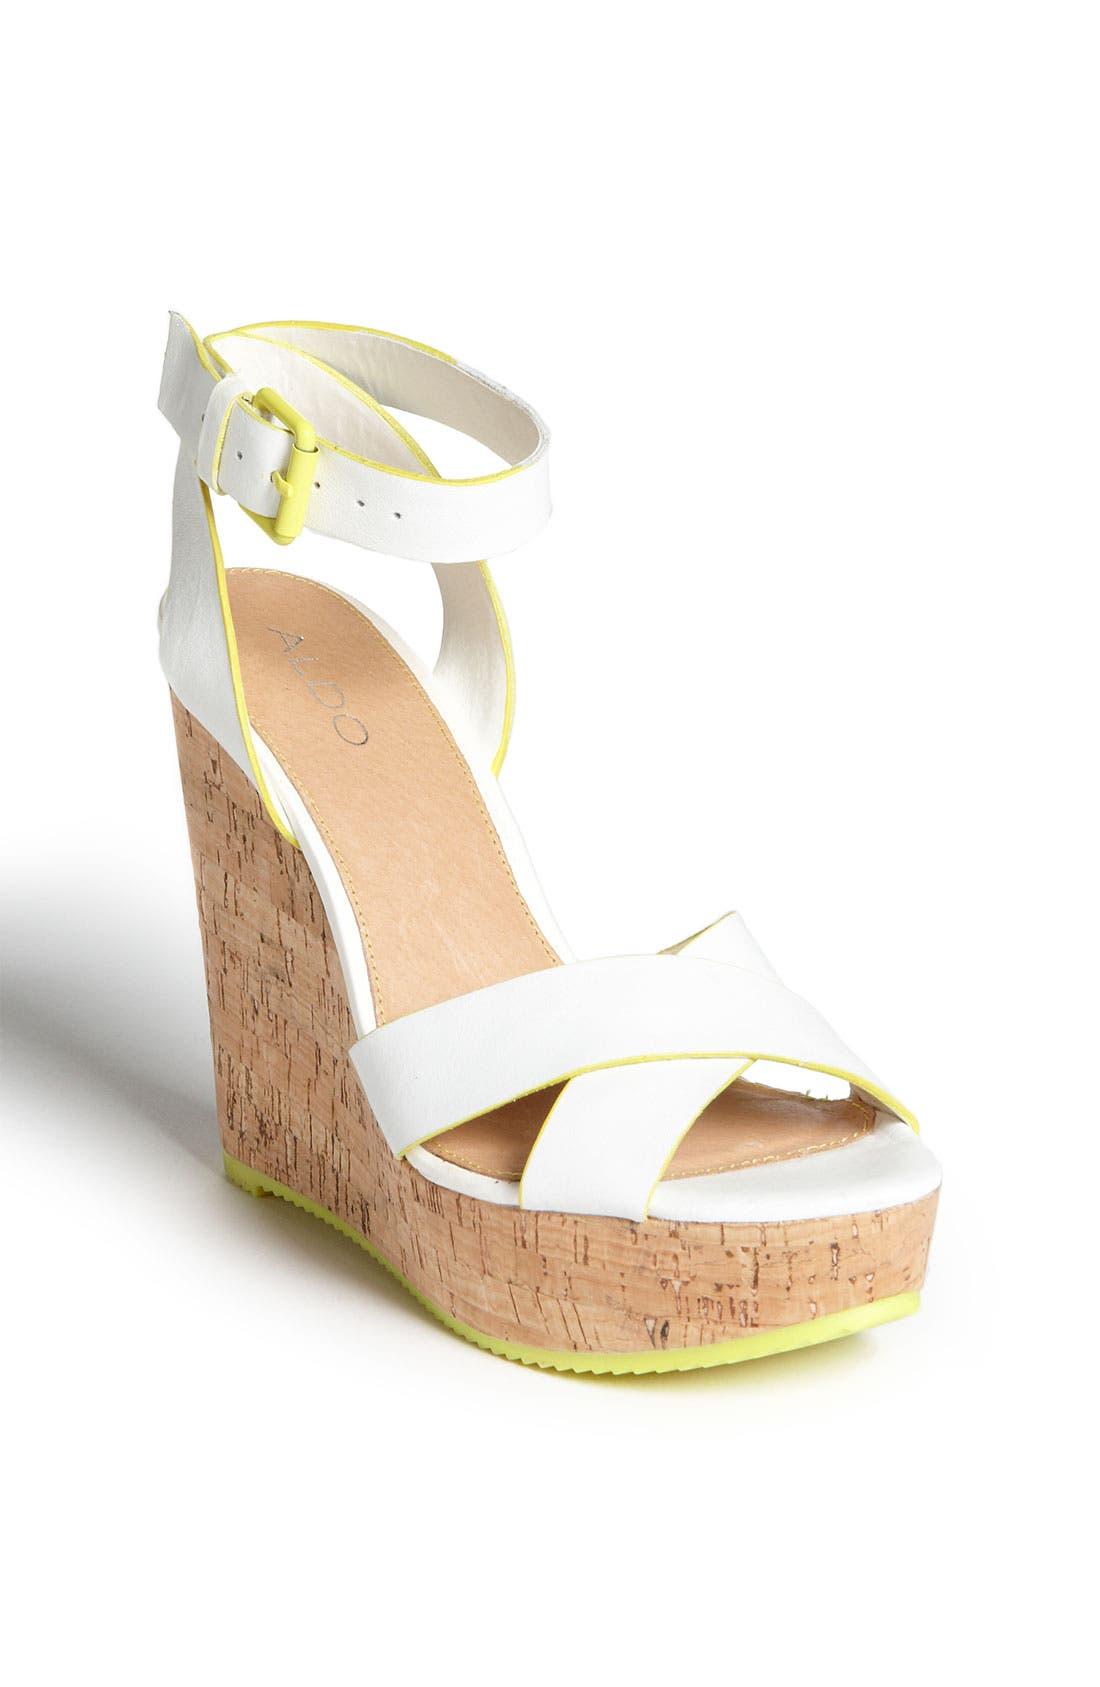 Alternate Image 1 Selected - ALDO 'Brimfield' Wedge Sandal